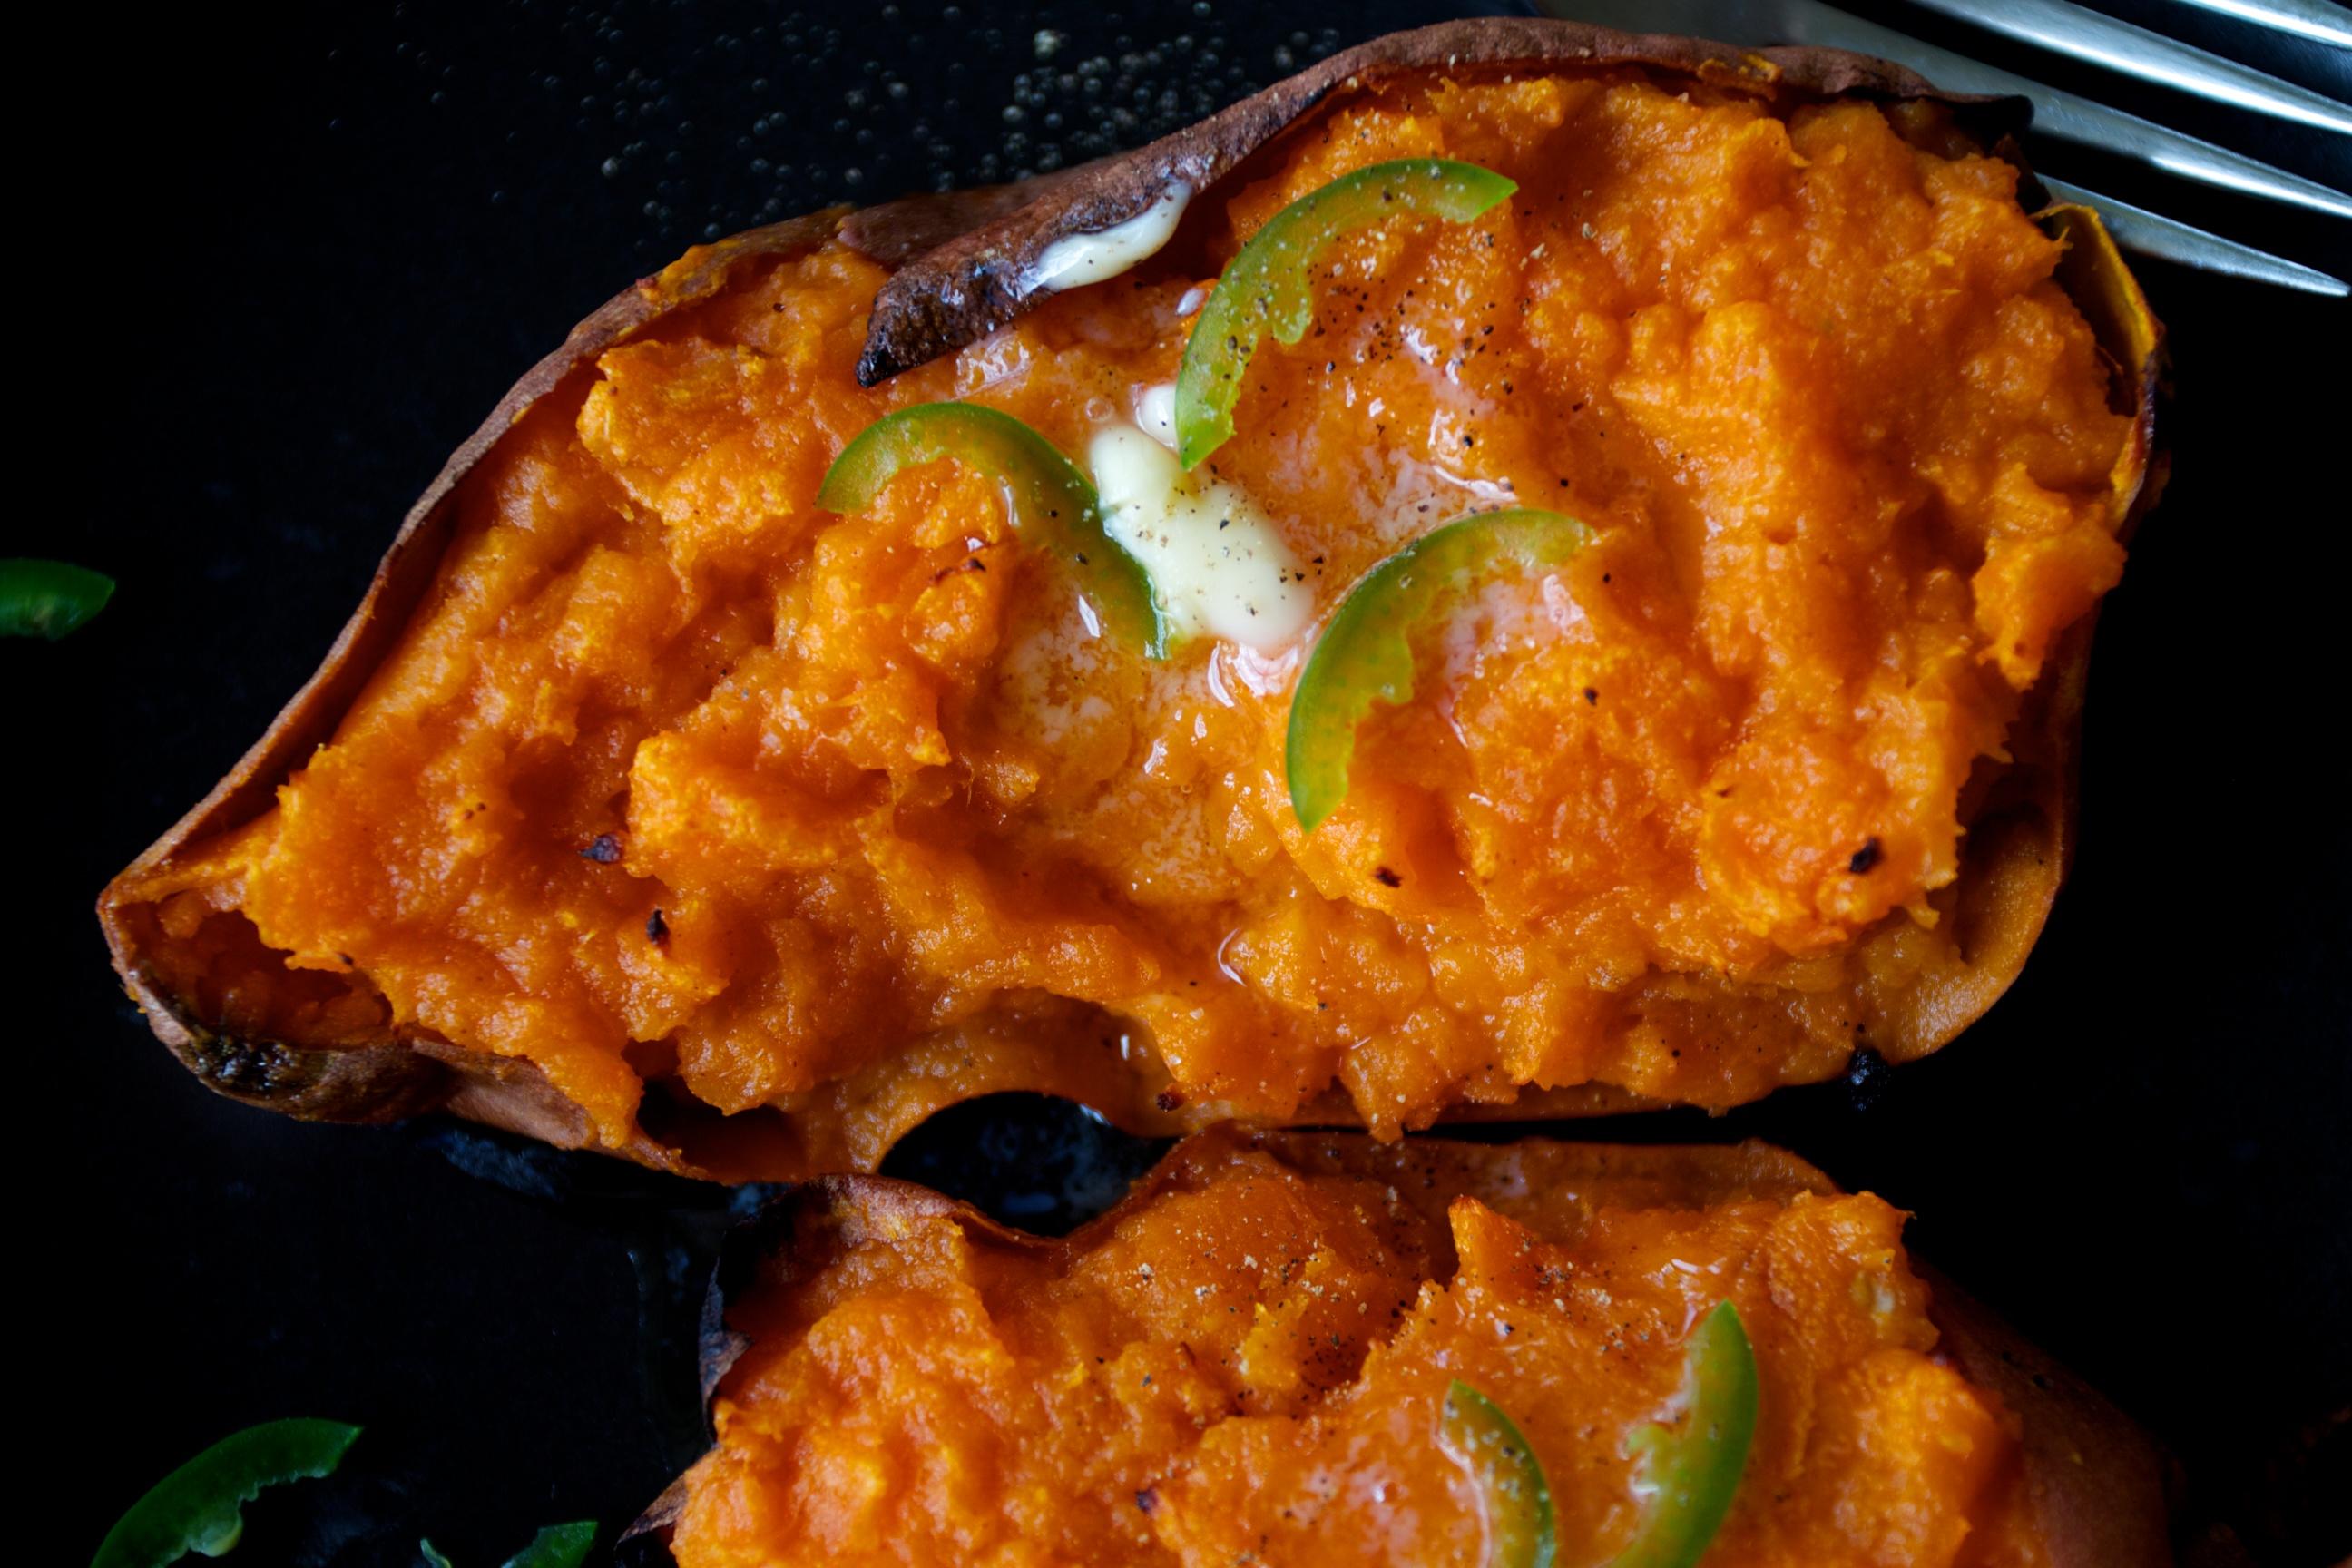 twice baked yams